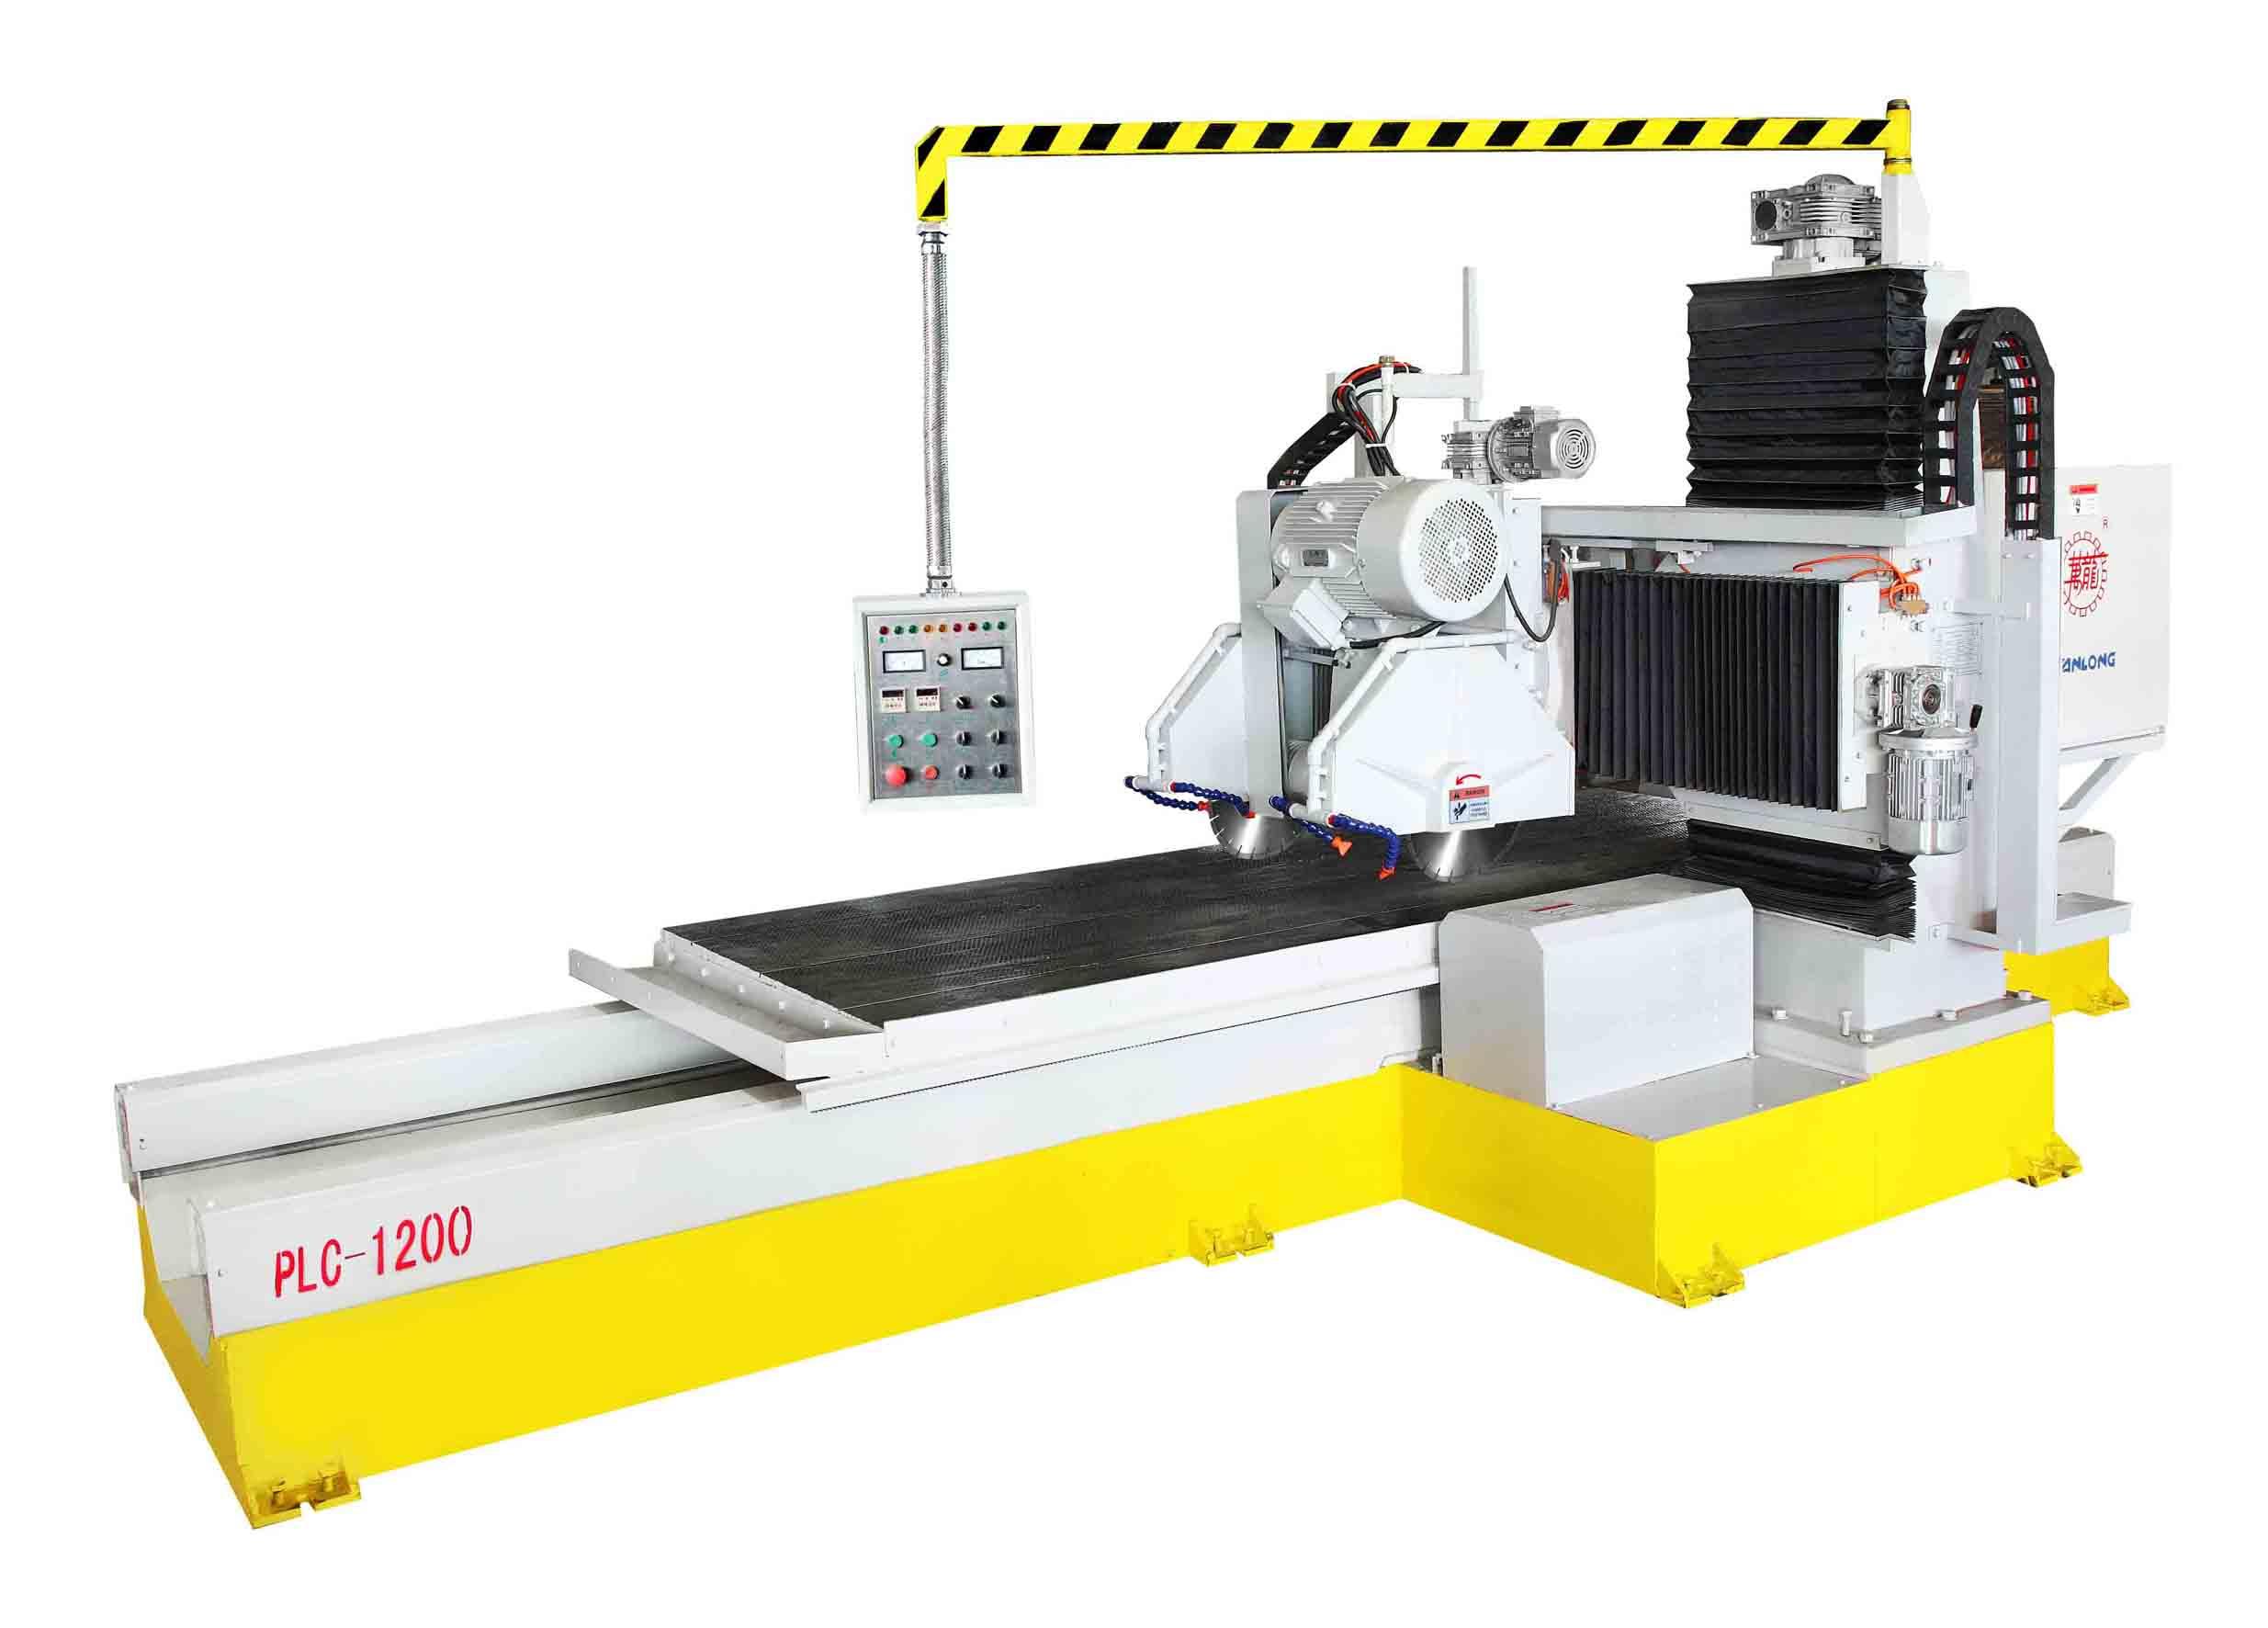 PLC-1200 Multifunctional Profile Machine